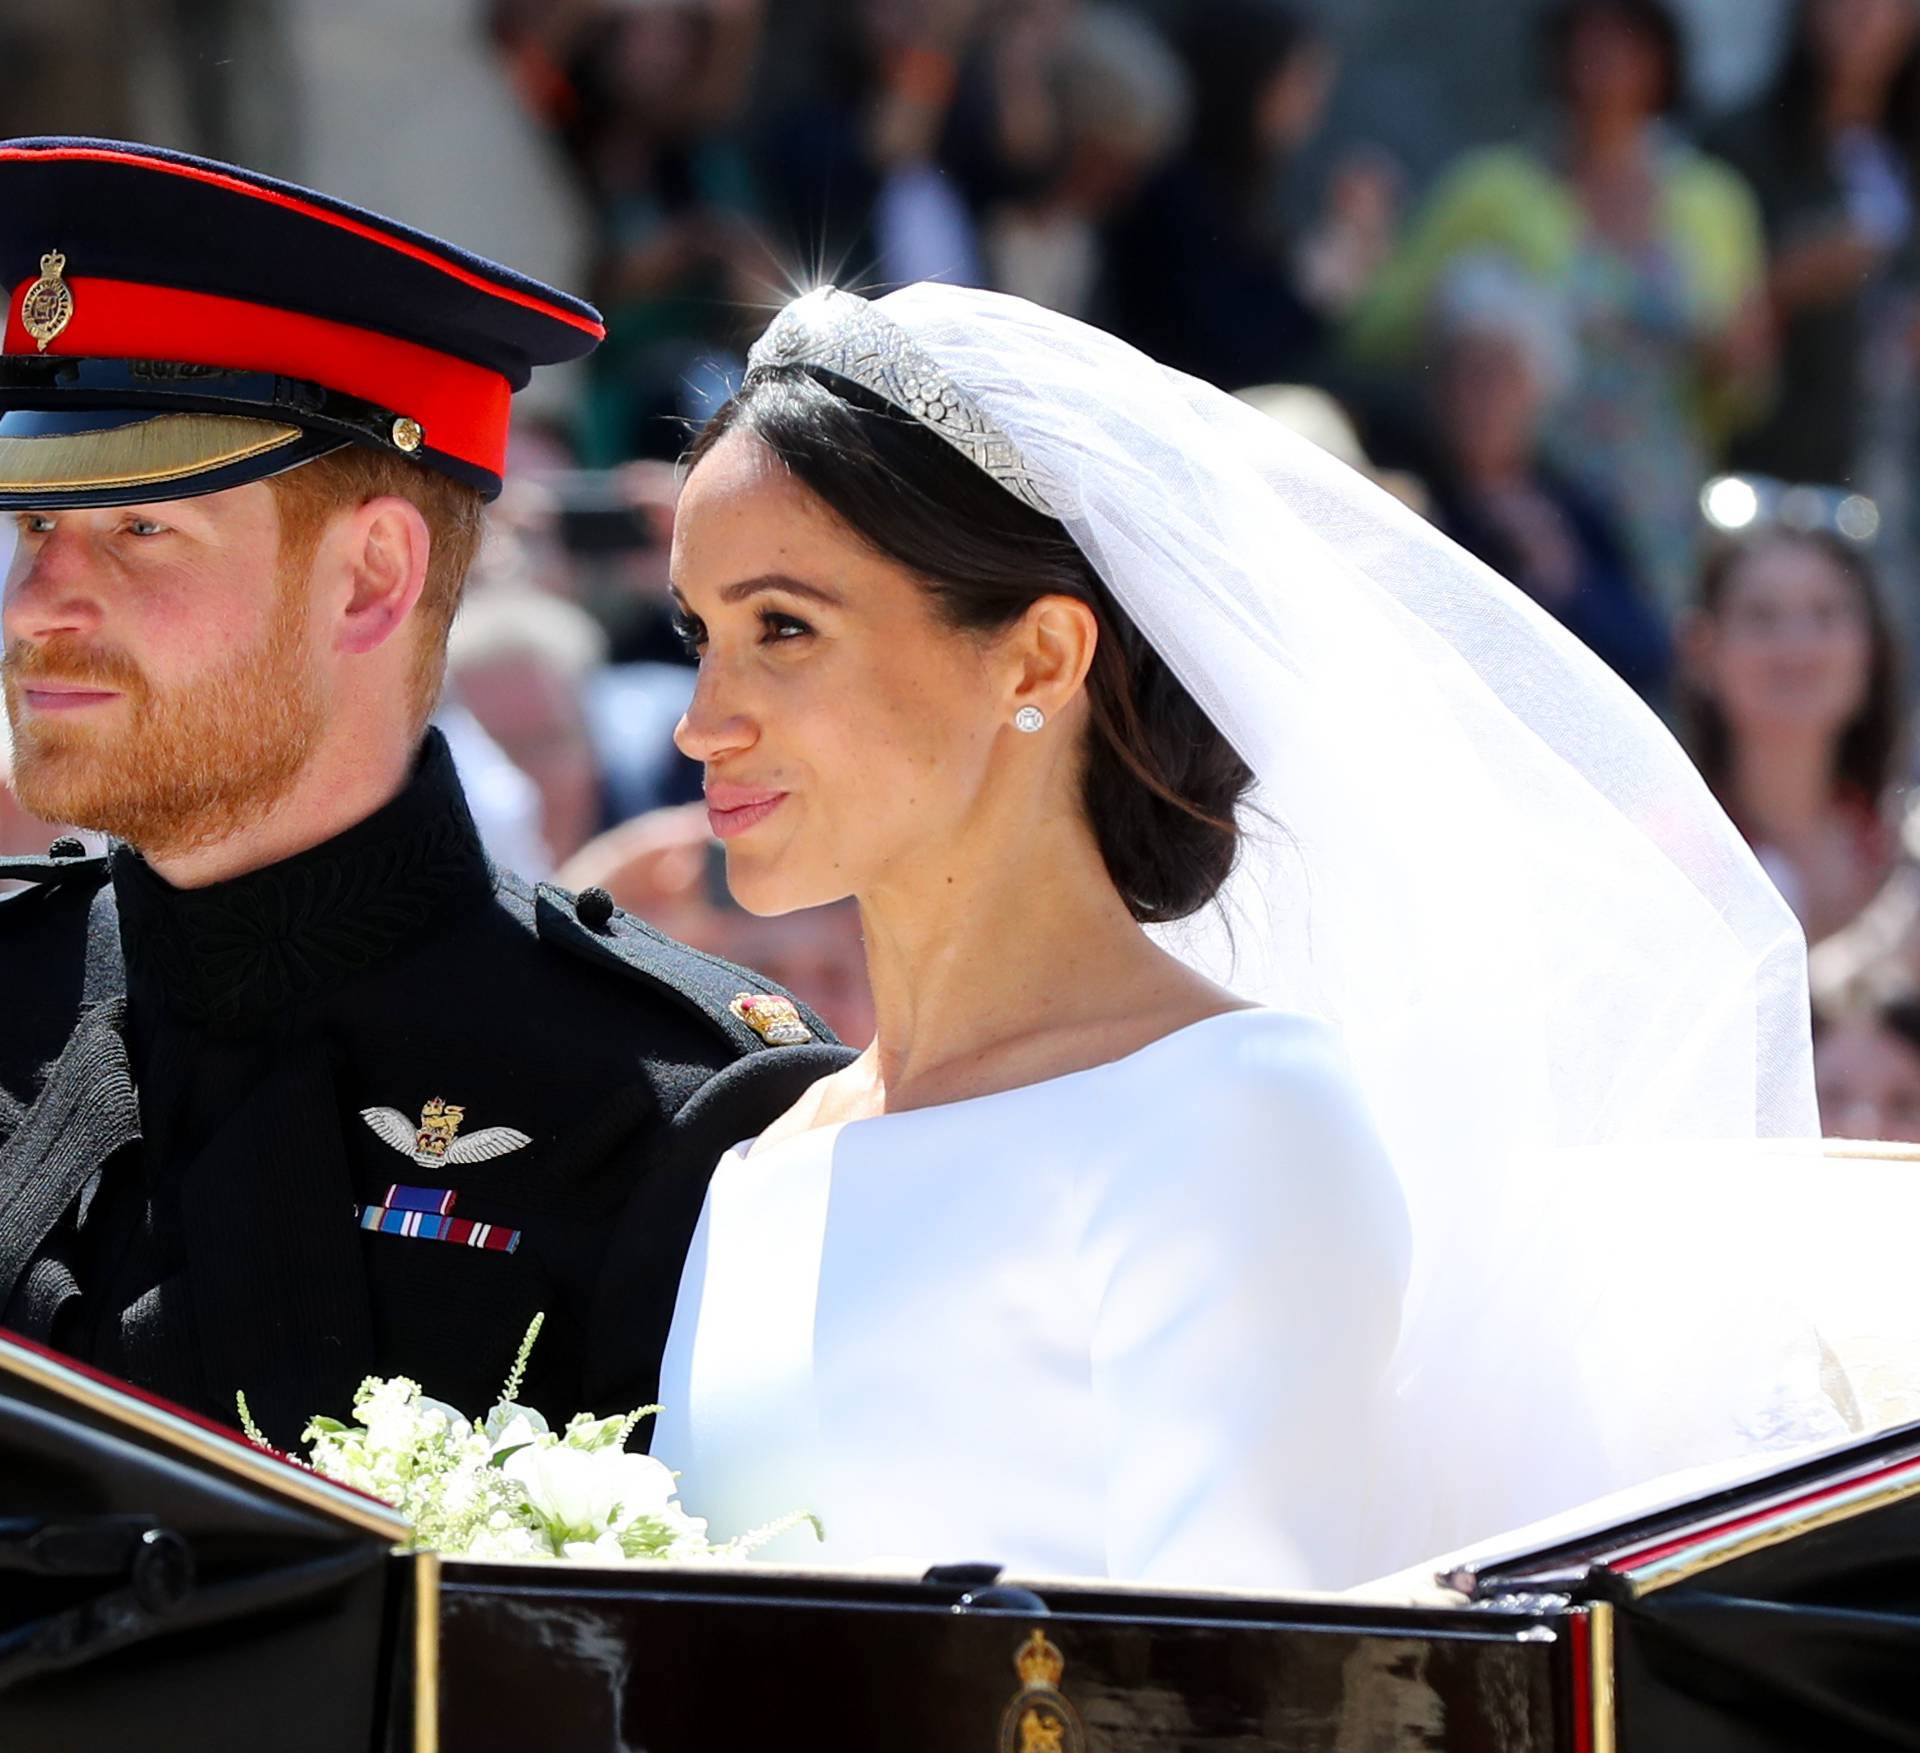 Duke and Duchess of Sussex statement